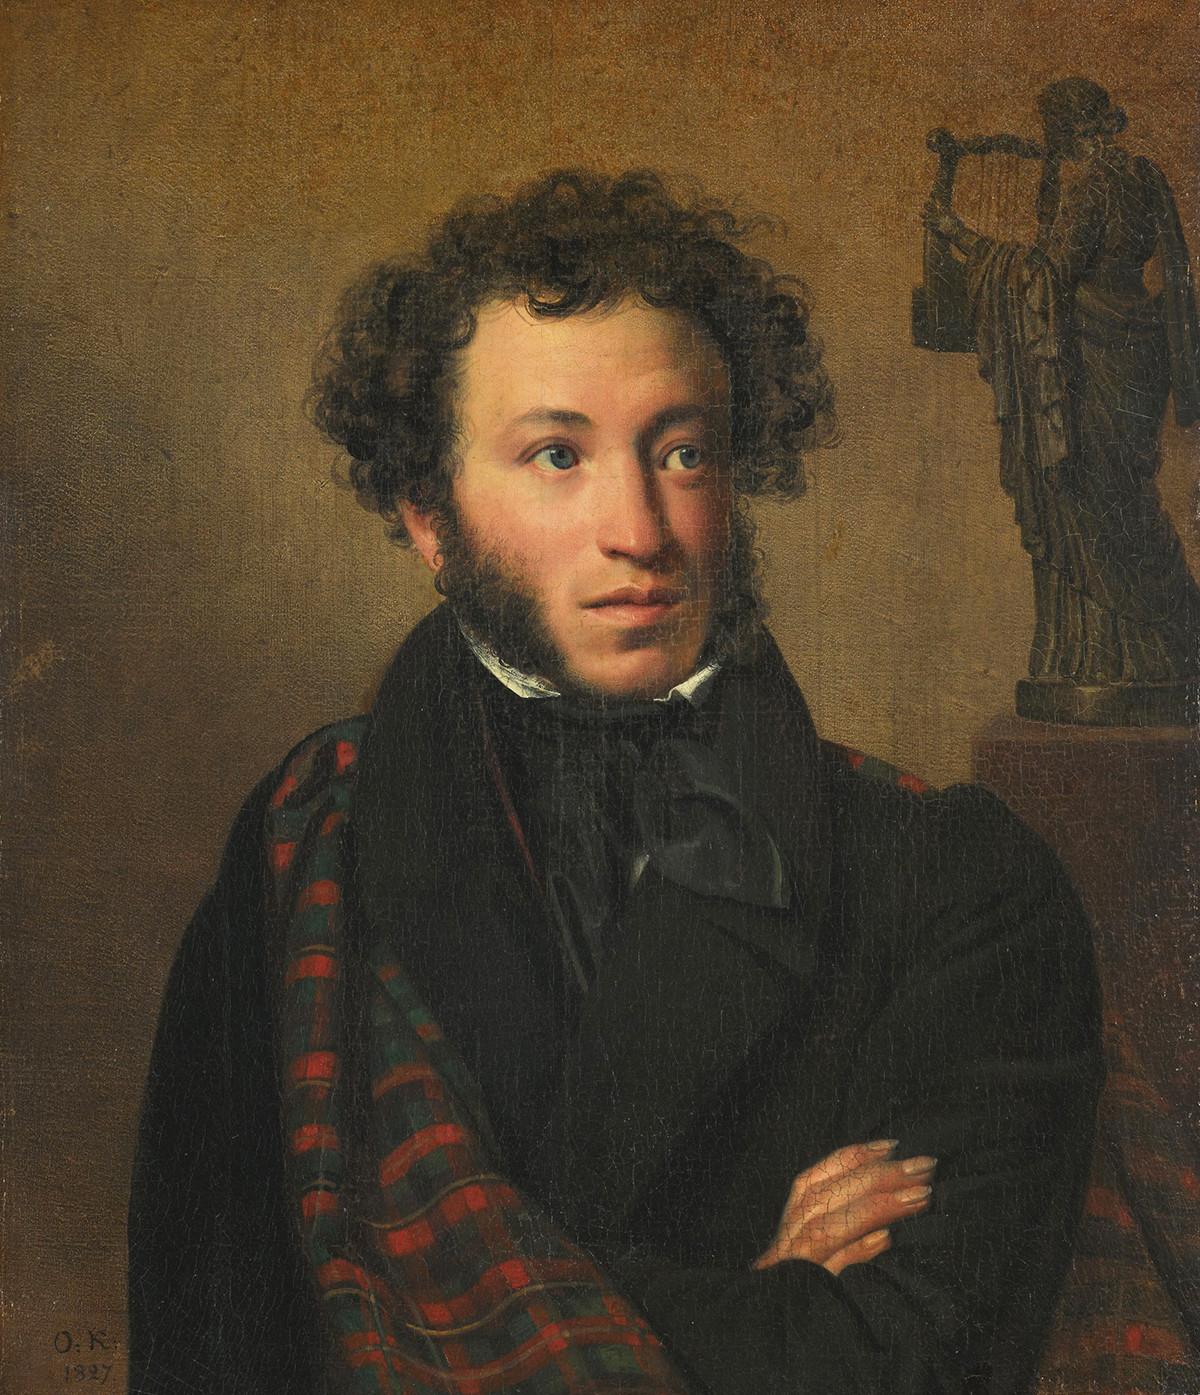 Aleksandr Pushkin ritratto di Orest Kiprenskij